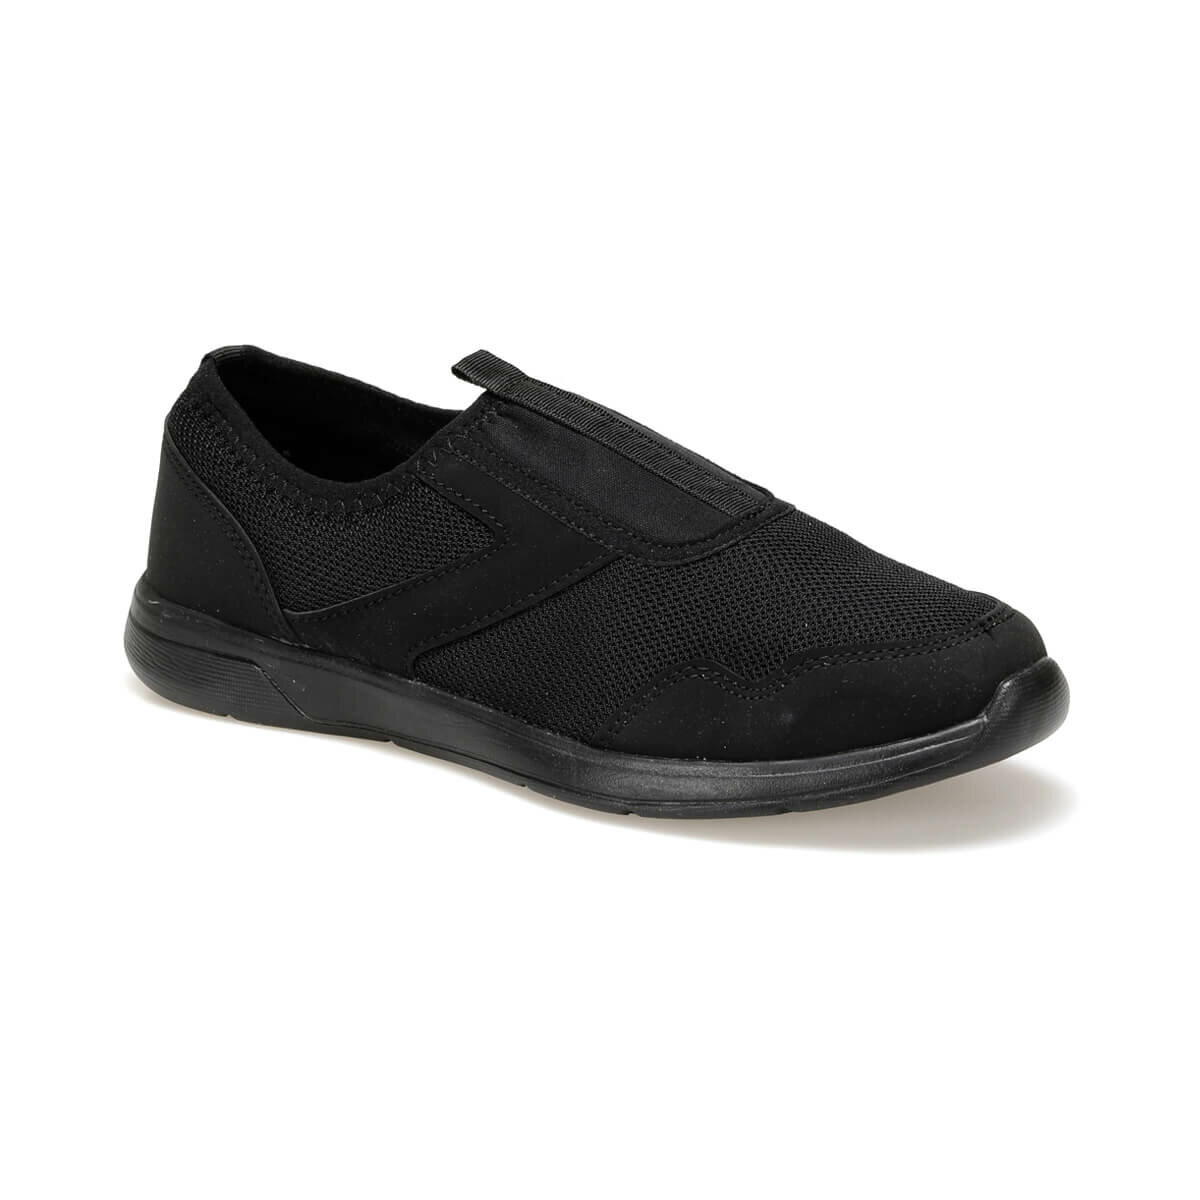 FLO RONI Black Men 'S Sneaker Shoes Torex